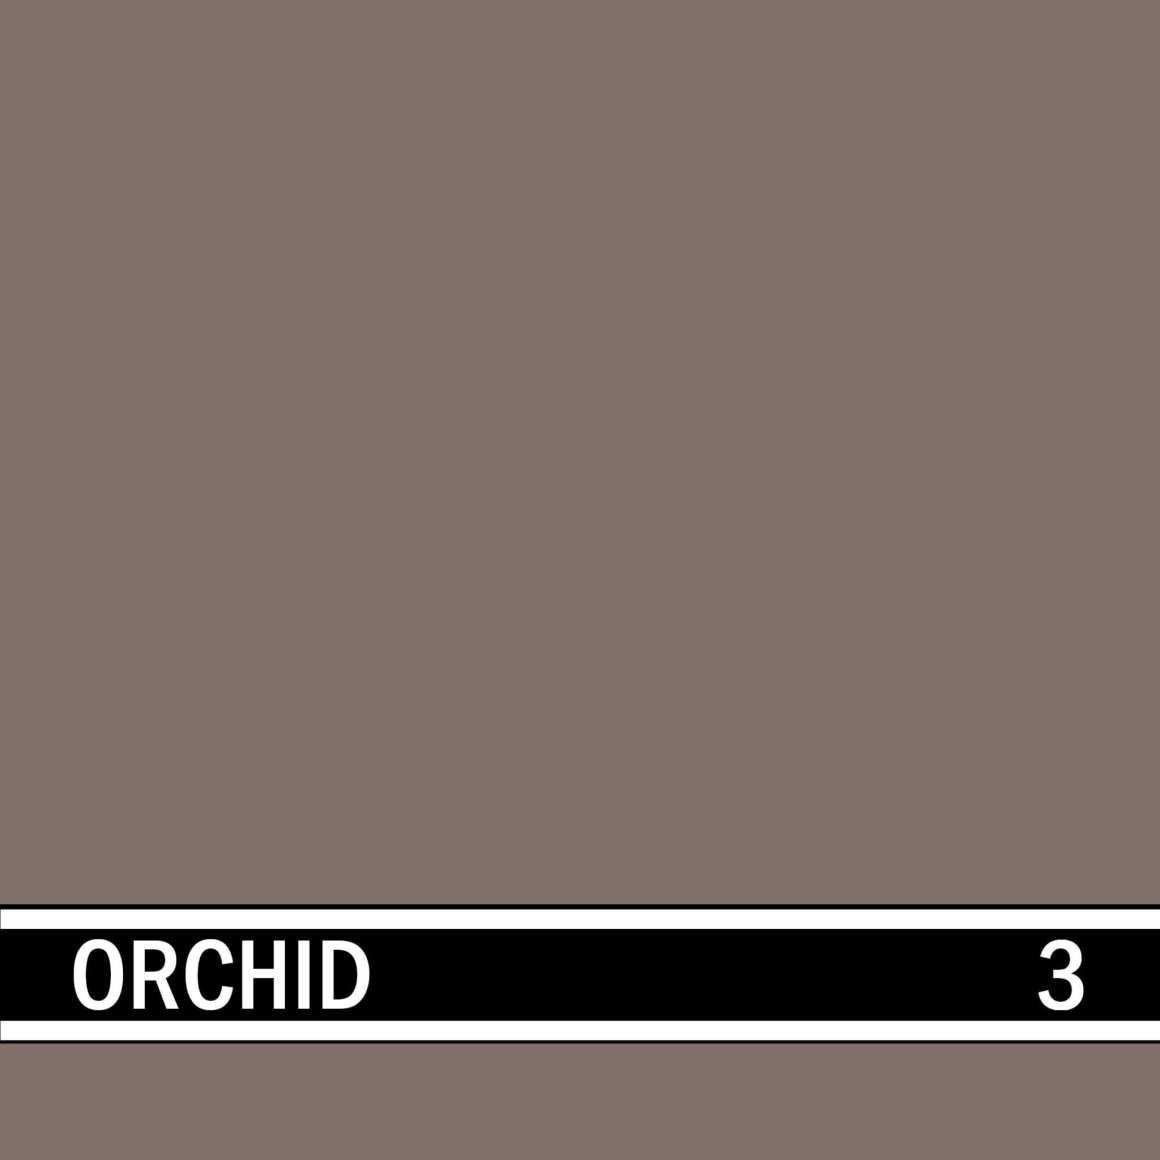 Orchid integral concrete color for stamped concrete and decorative colored concrete